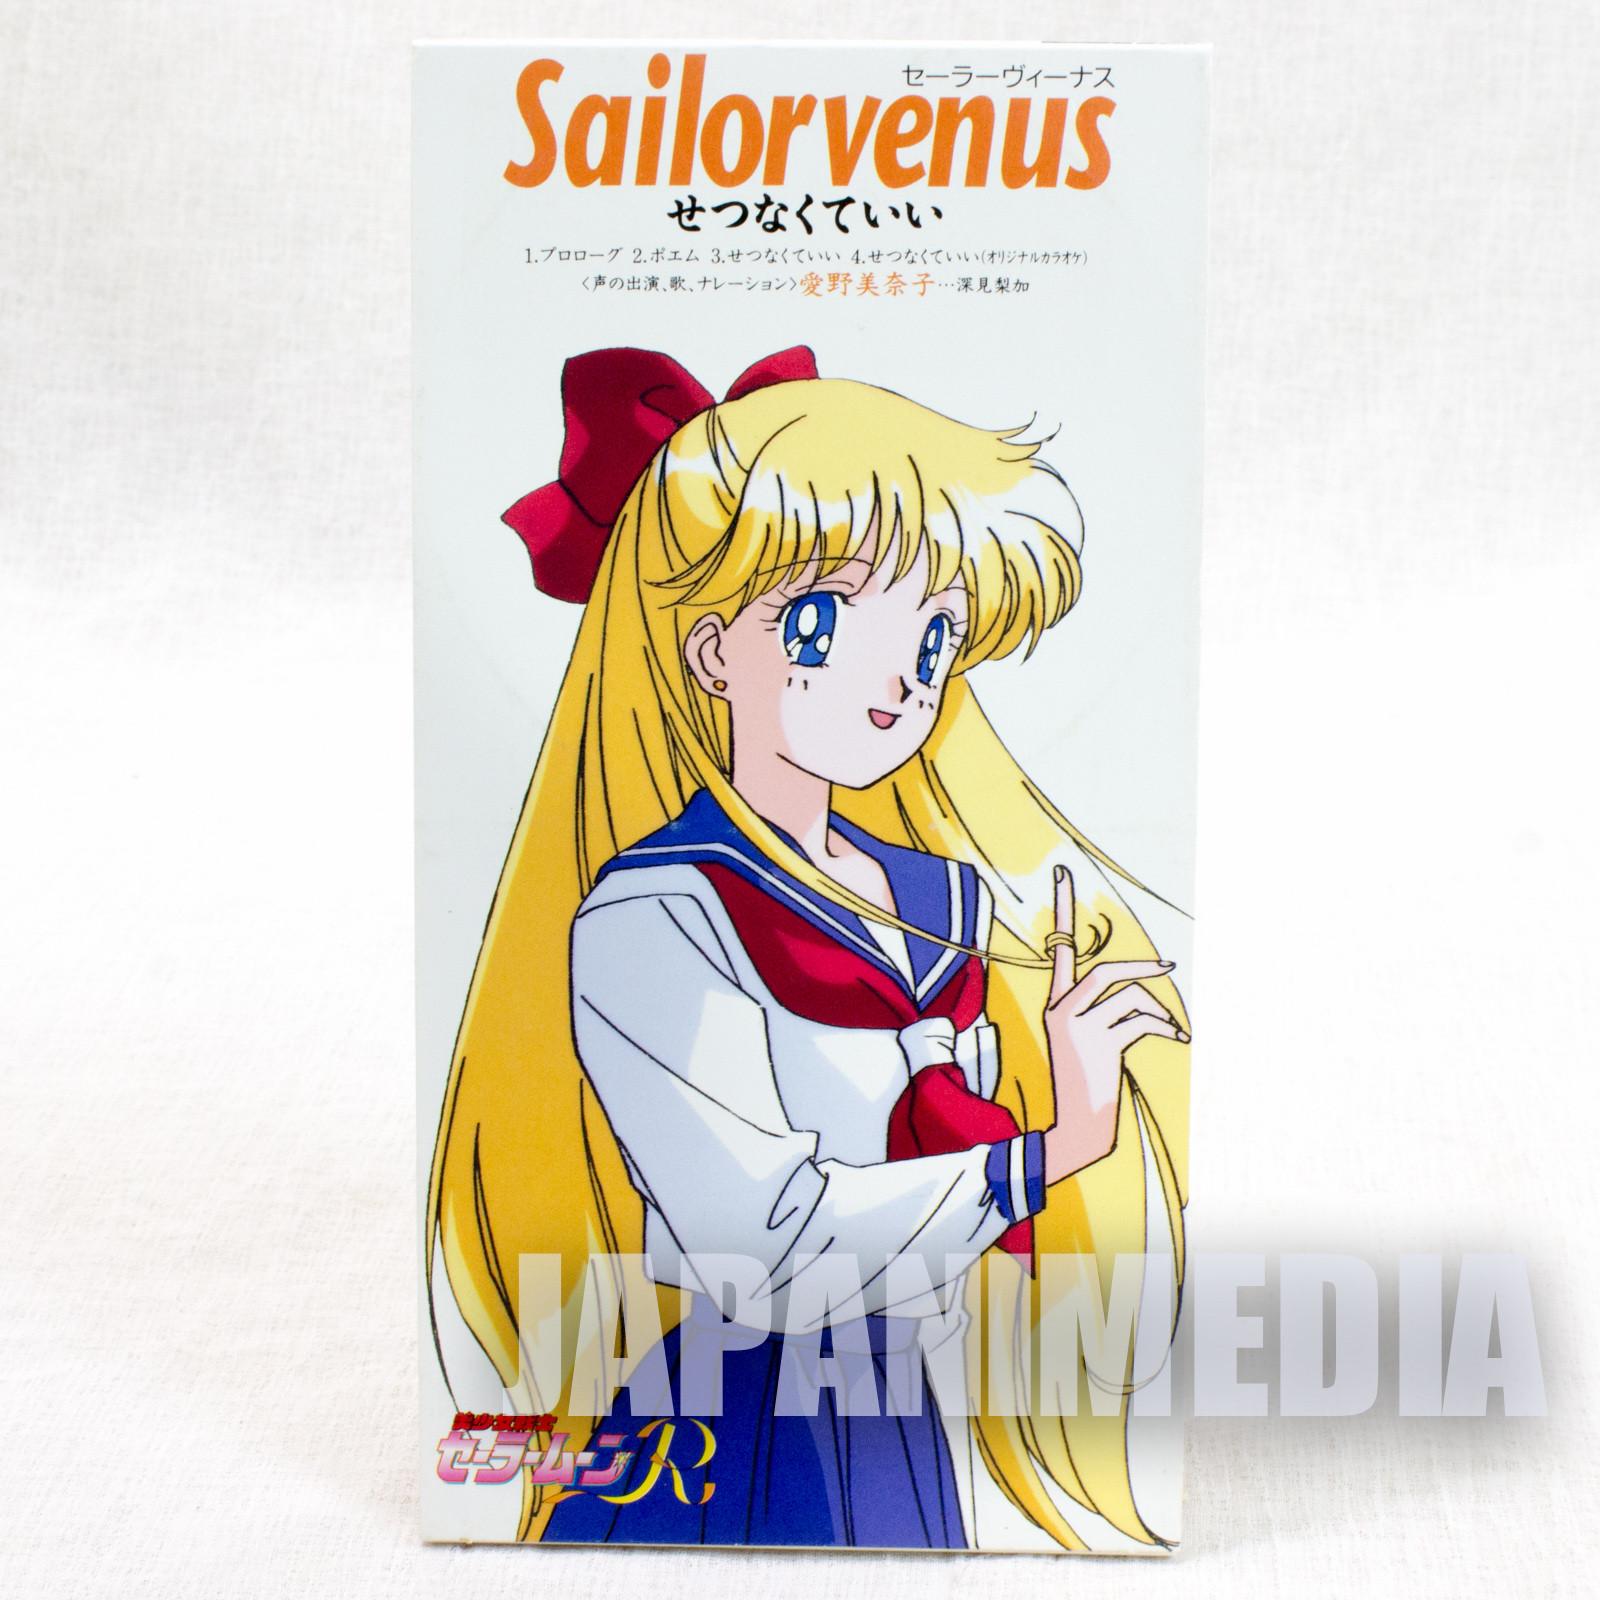 Sailor Moon R Minako Aino (Sailor  Venus) Character Song JAPAN 3 inch 8cm CD Single ANIME